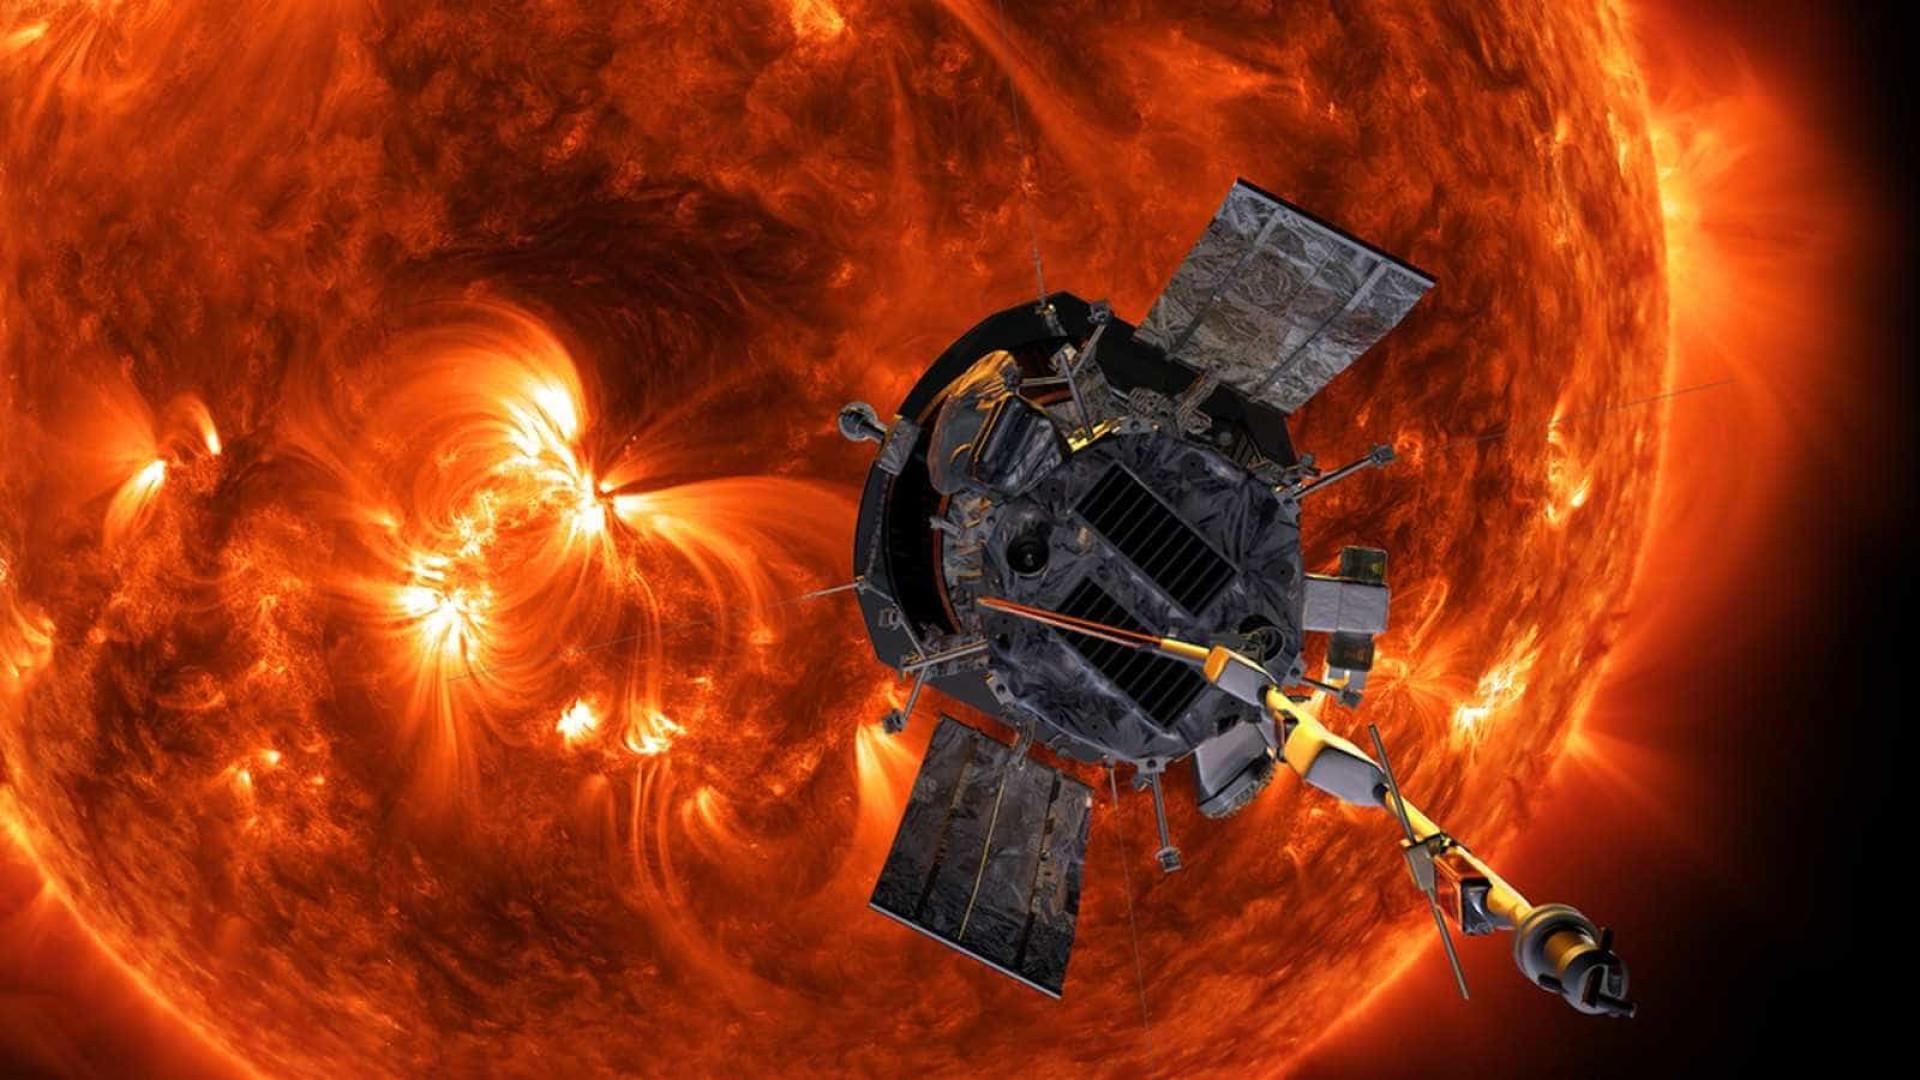 Nave hiper-resistente ao calor pretende ser a primeira a 'tocar' o sol